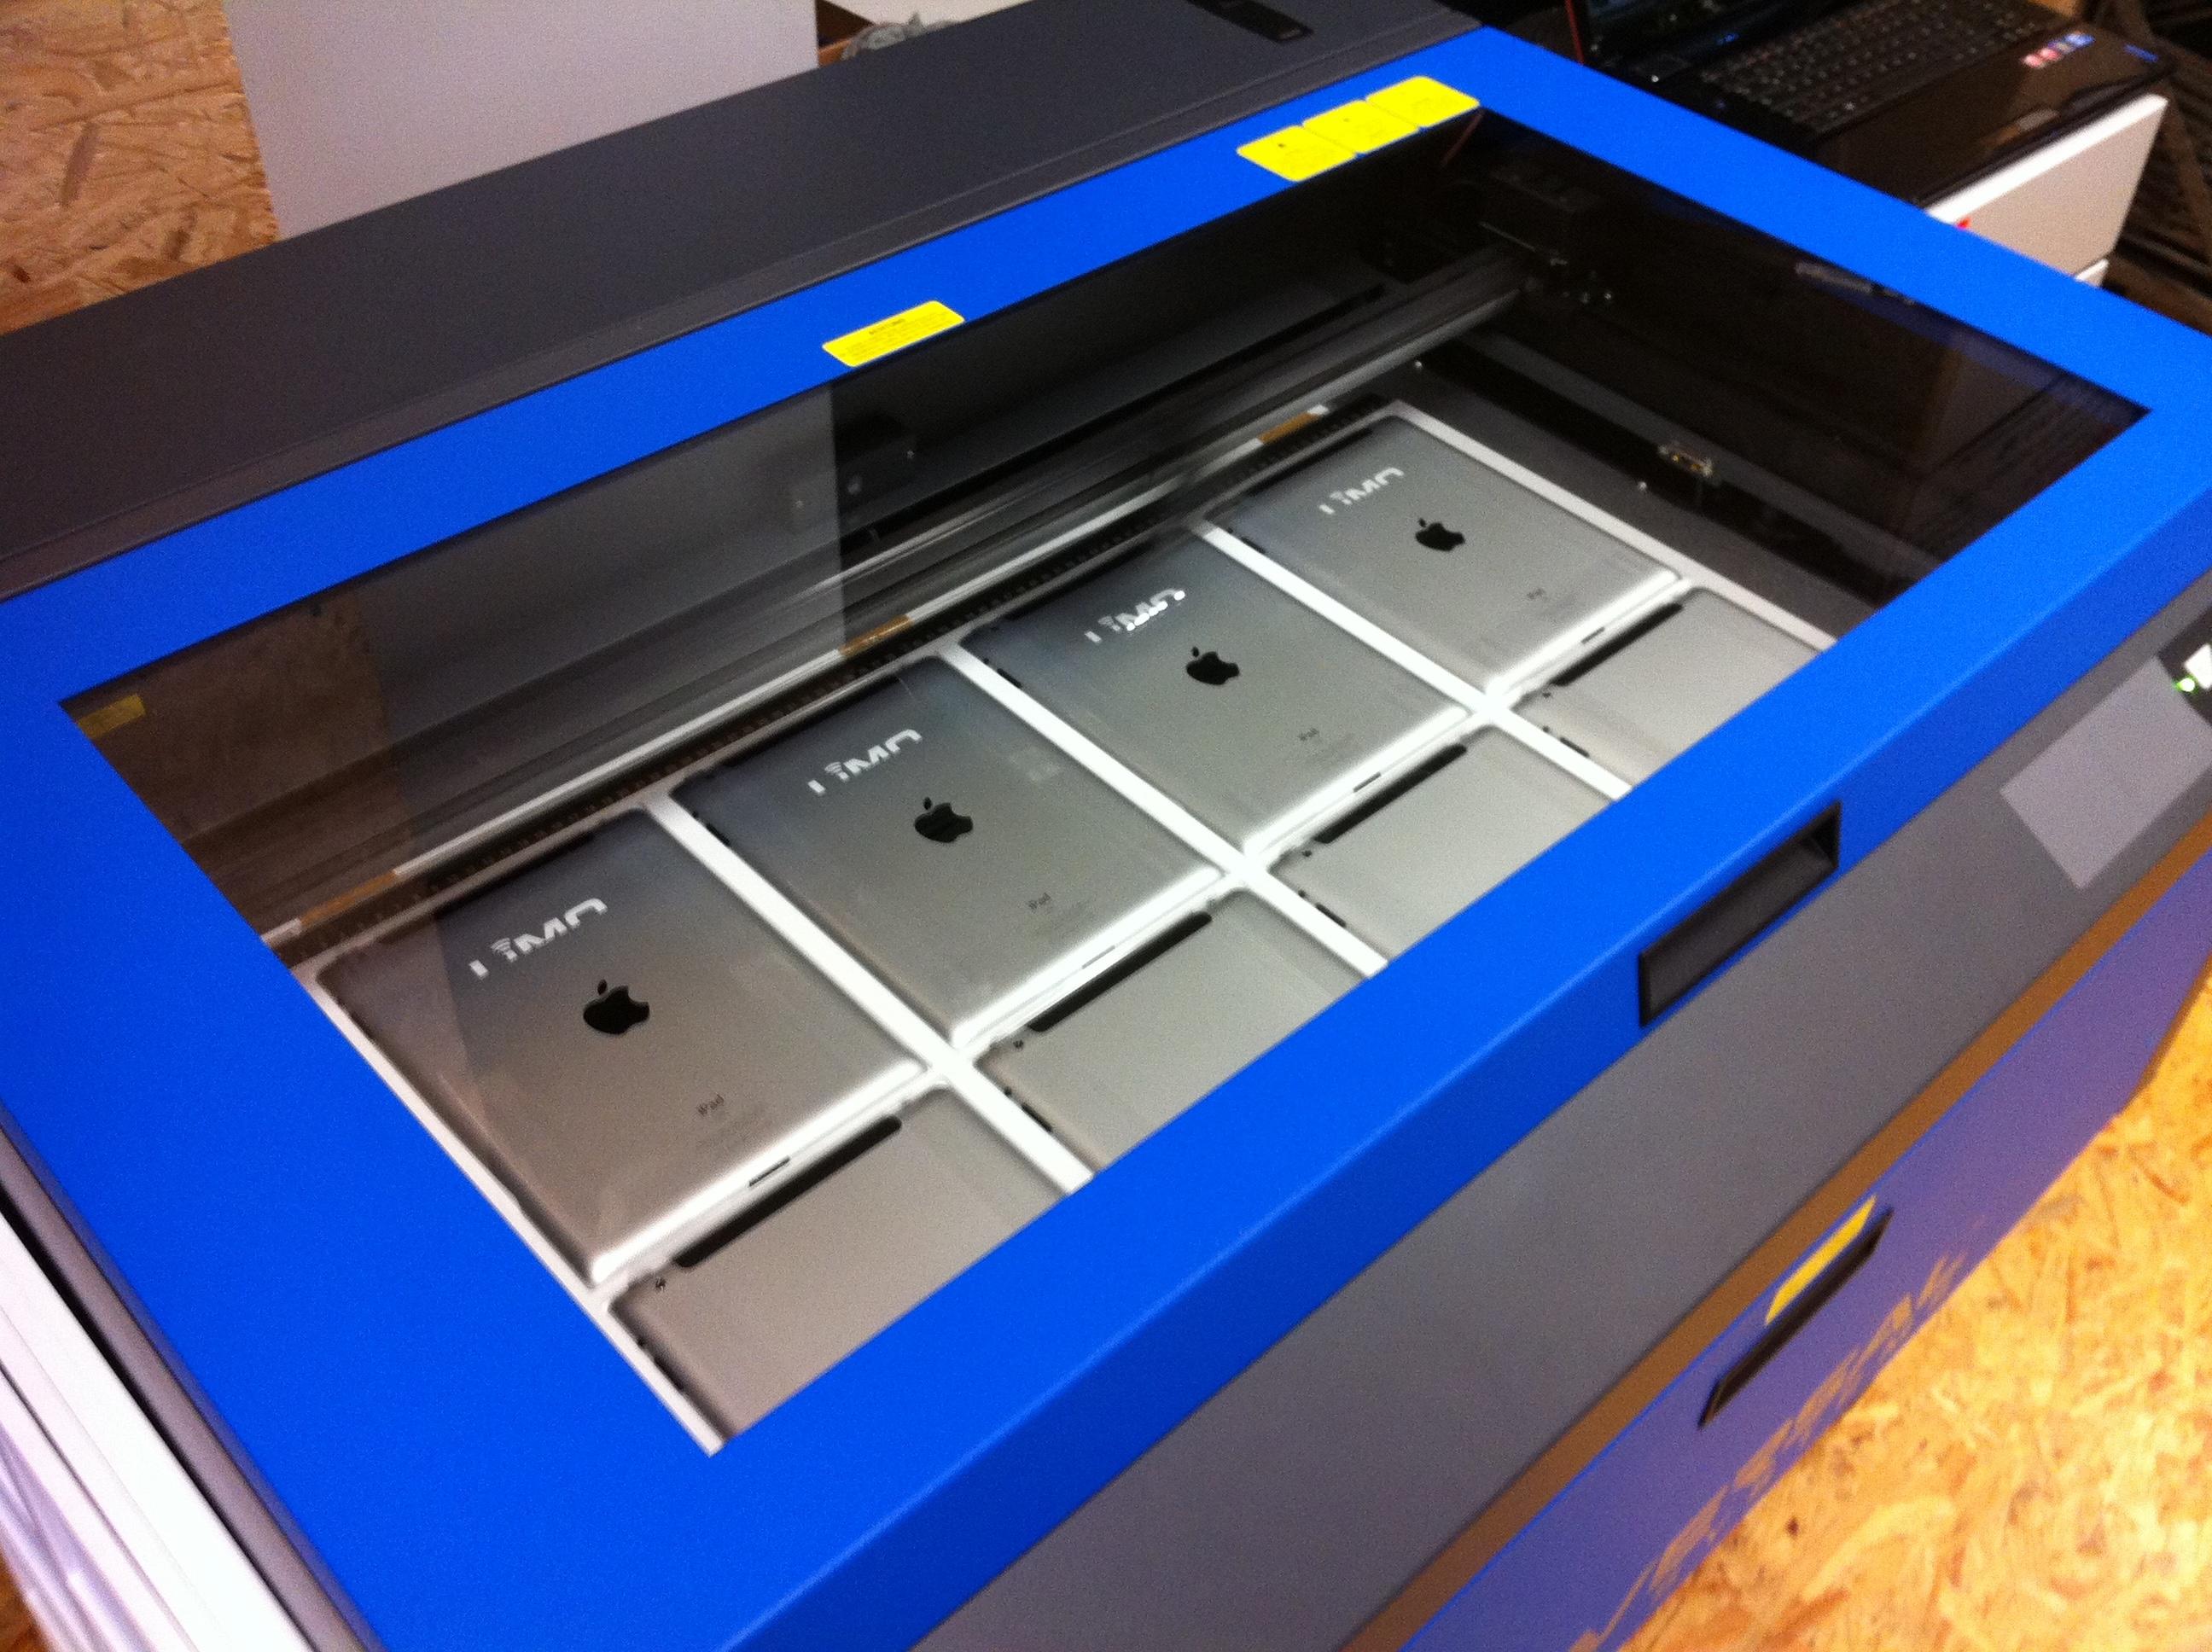 iPad in Laser Gravur Maschine